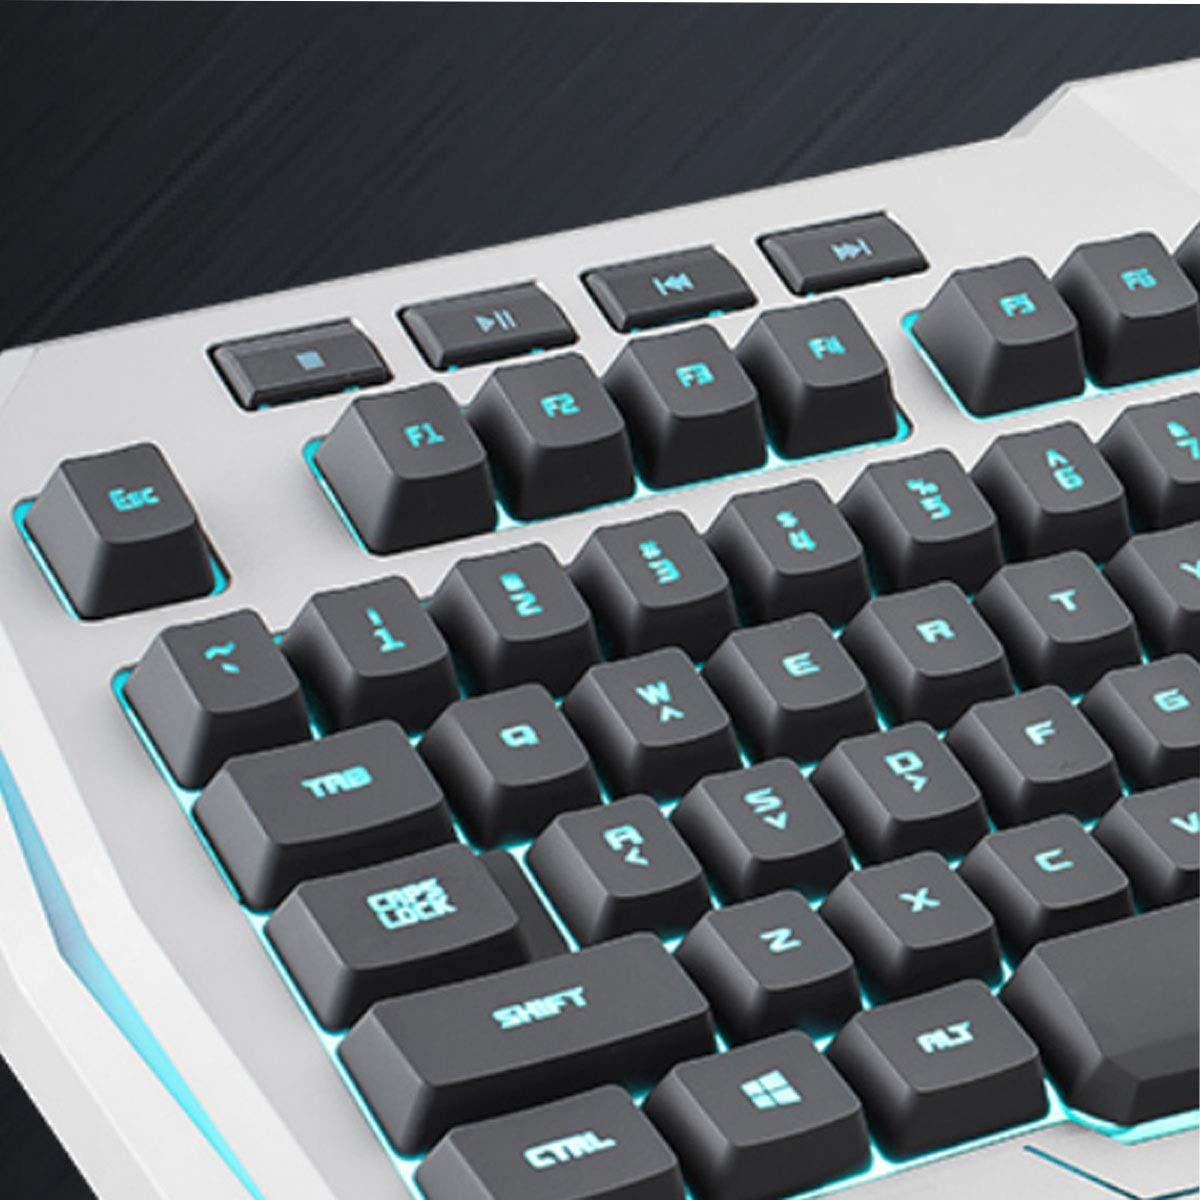 Color : Silver Noble Desktop Notebook Universal Cable Style White, 49214cm Jiansheng01 Keyboard Robotic Esports Computer Keyboard